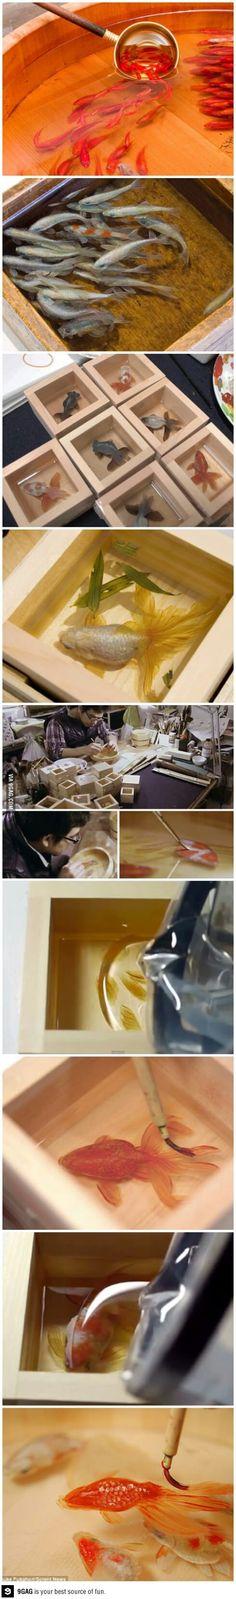 3D Goldfish Paintings on resin layers, by Japanese Artist Riusuke Fukahori.